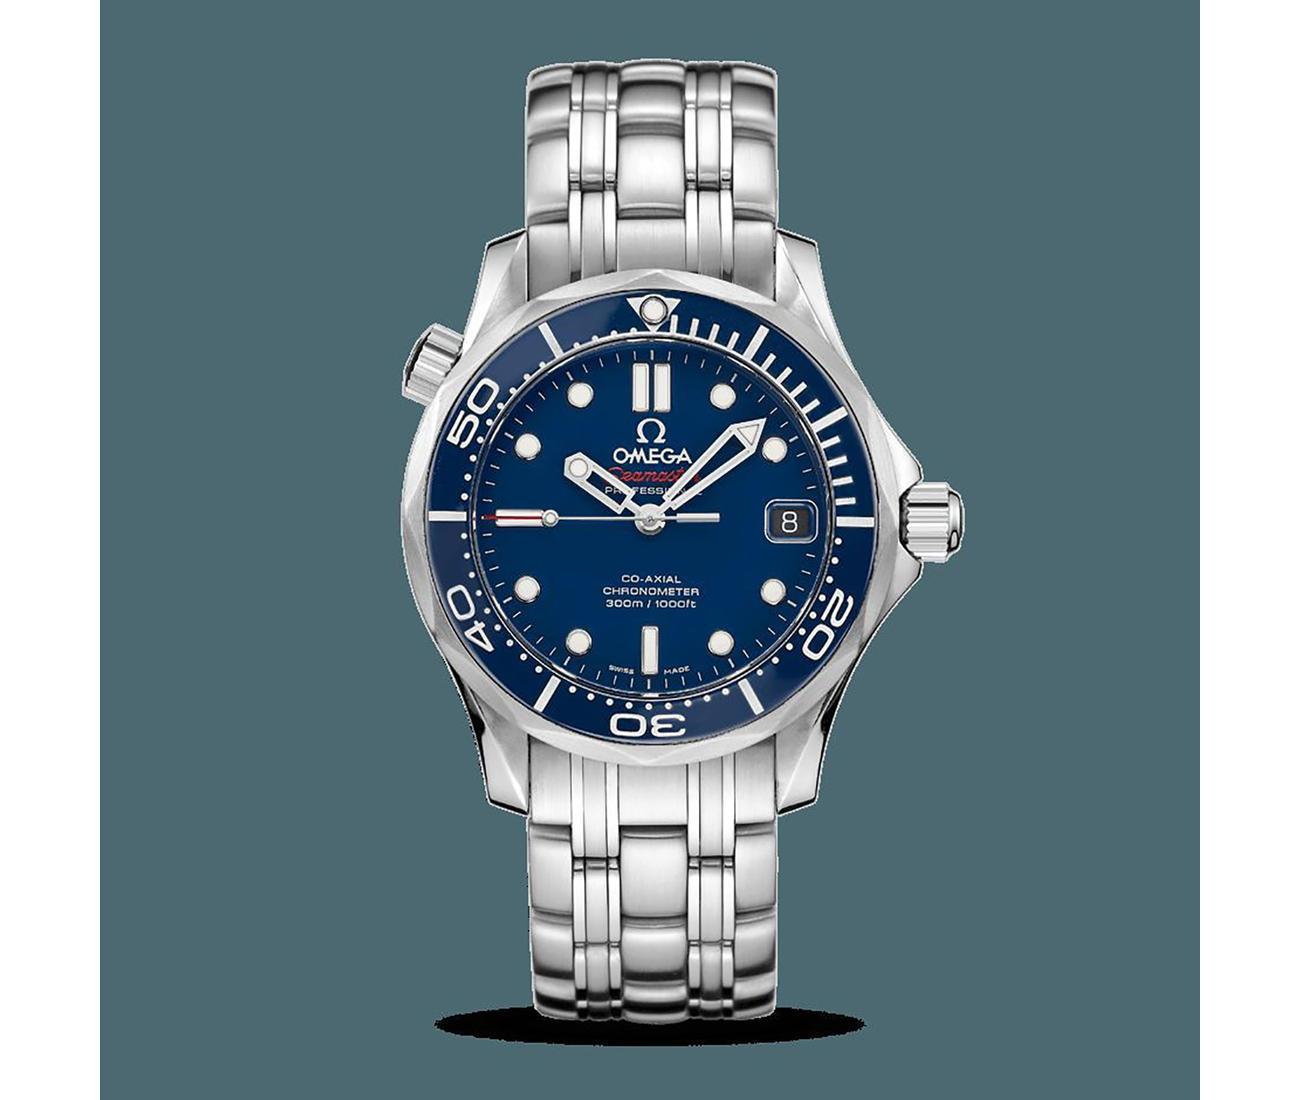 Diver 300 M Co-axial